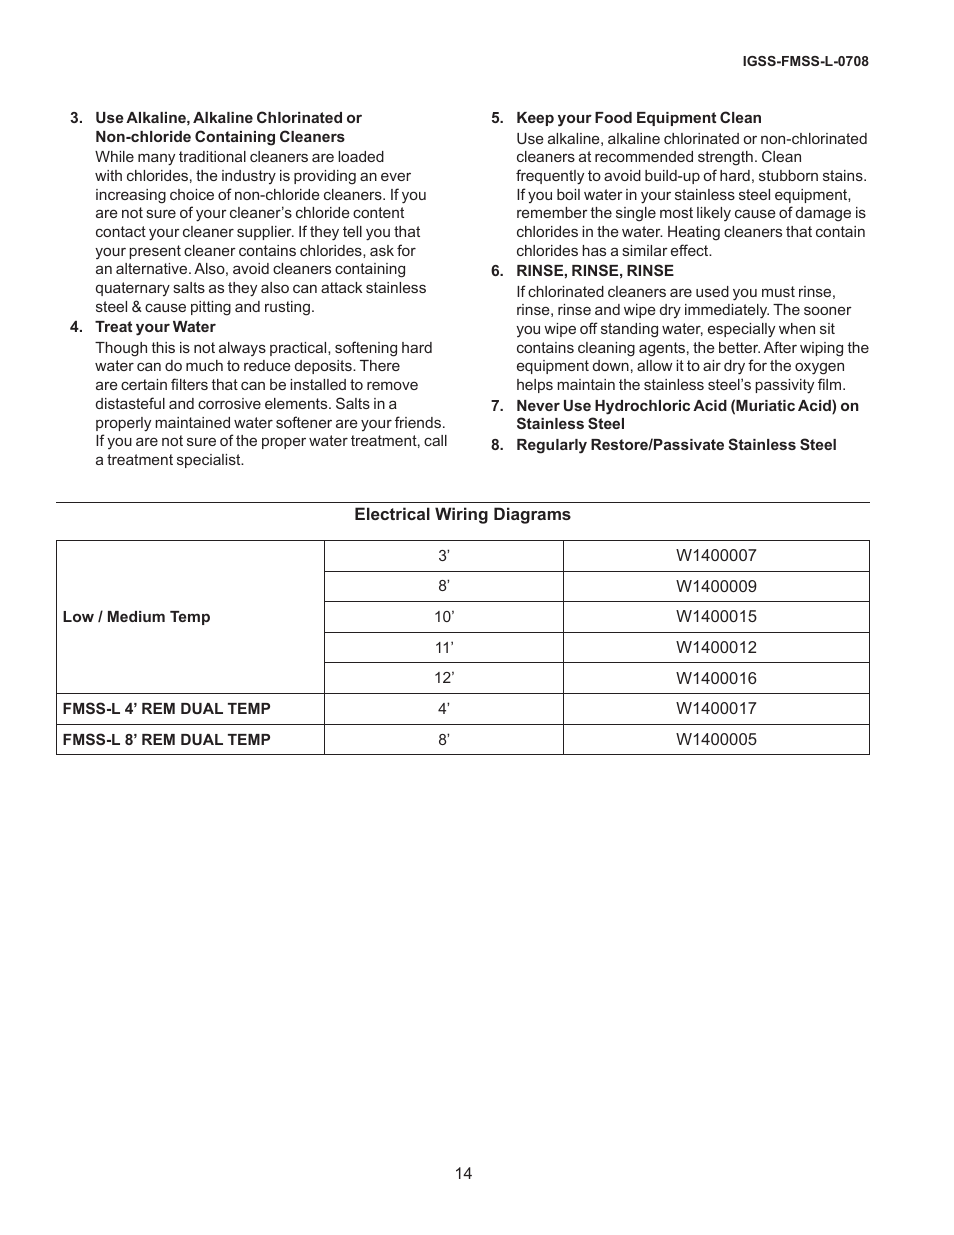 Electrical Wiring Diagrams Hussmann Fmss L User Manual